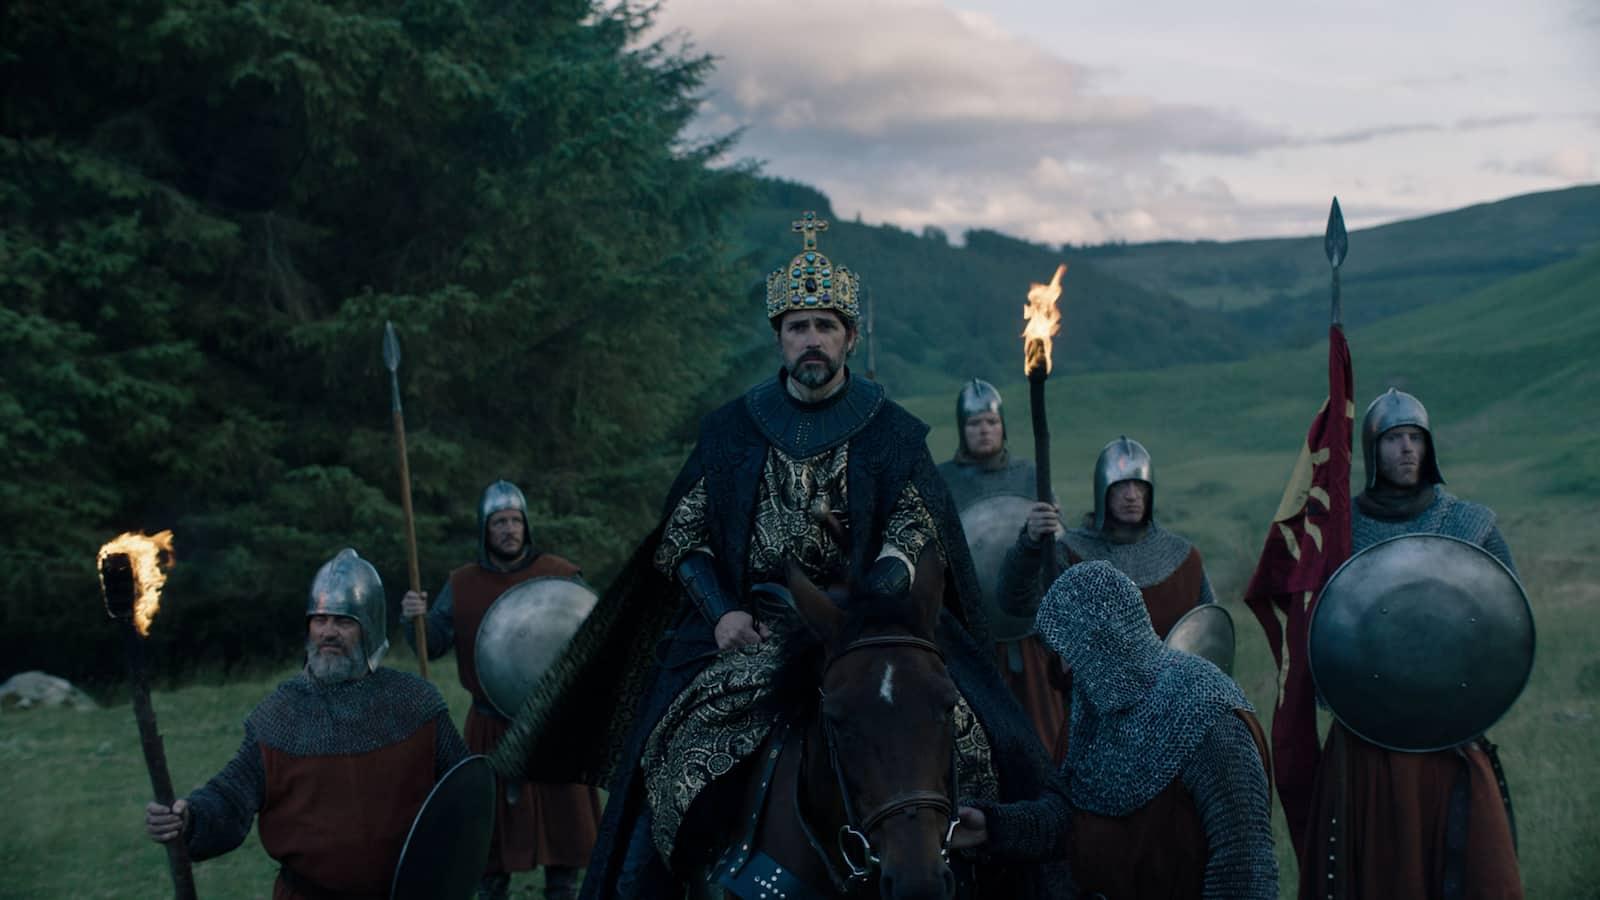 vikingarnas-sista-resa